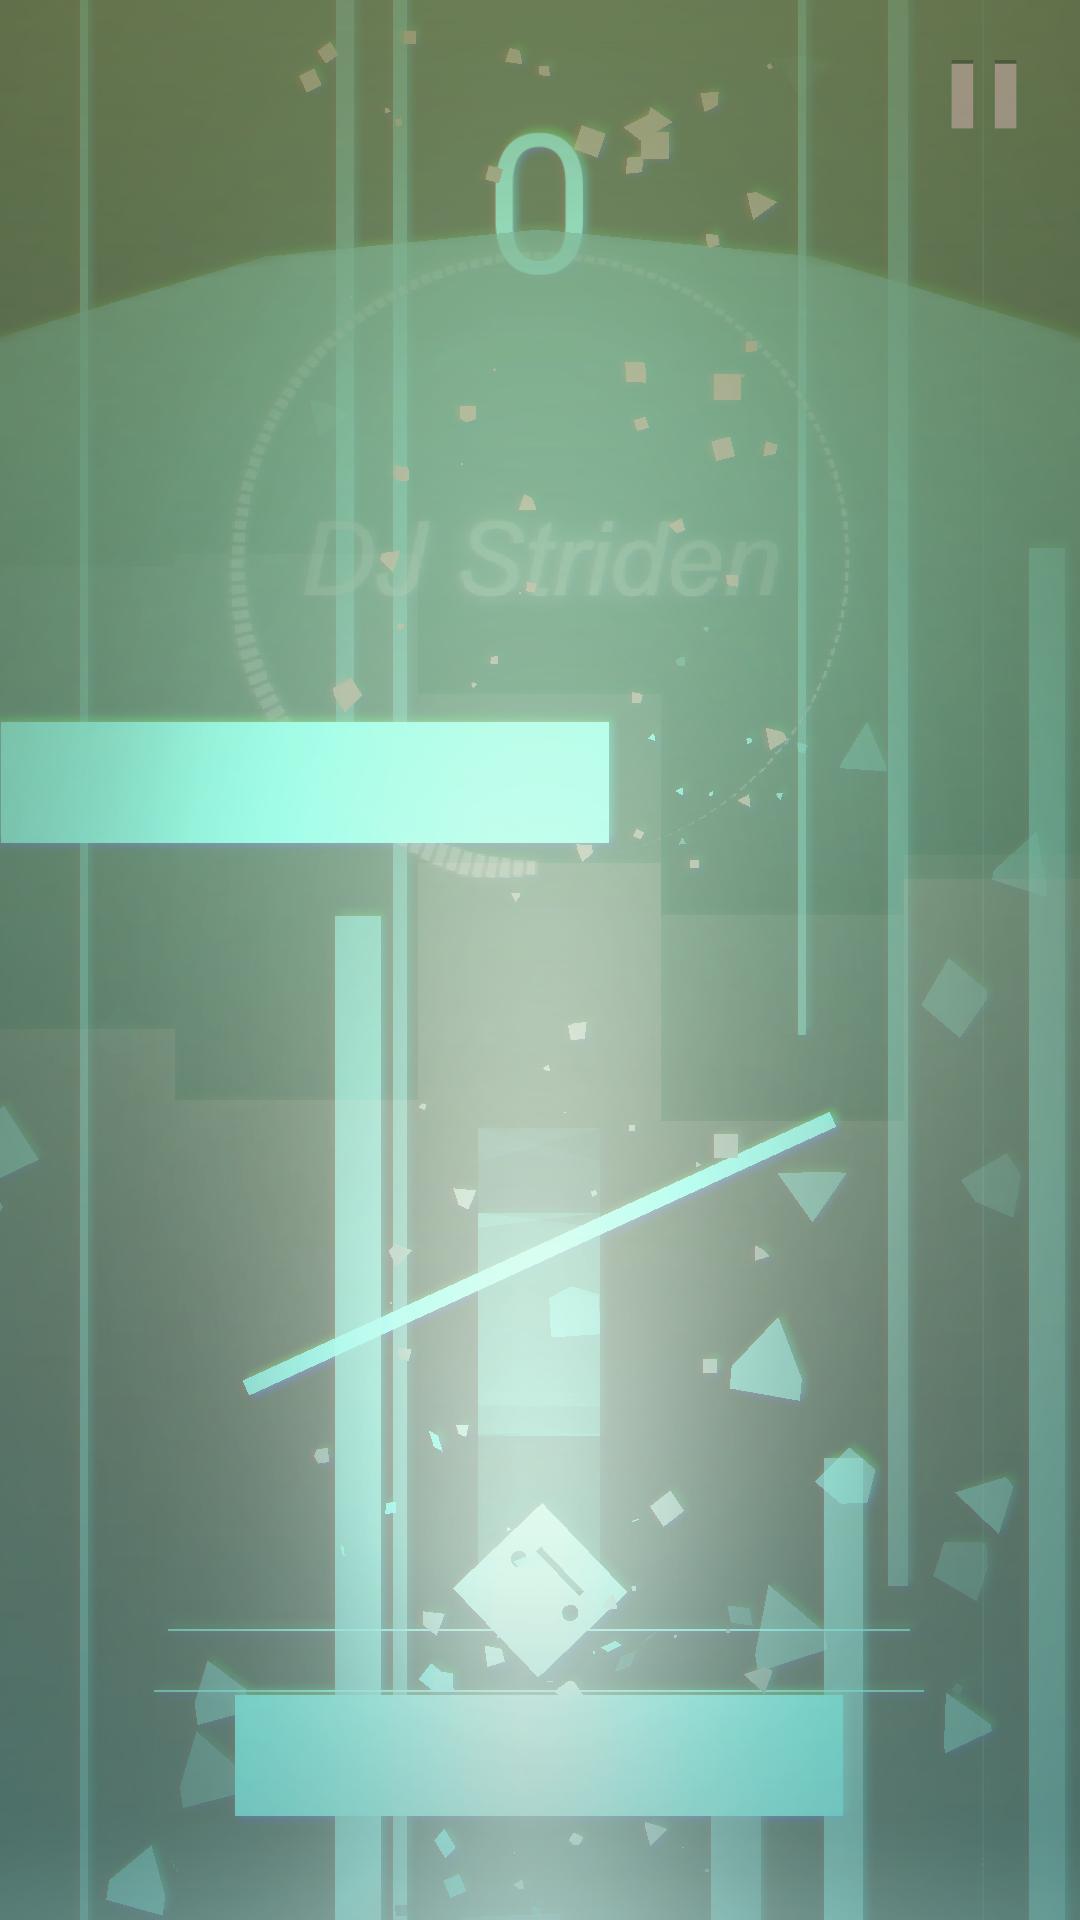 androidアプリ Beat Stomper攻略スクリーンショット3